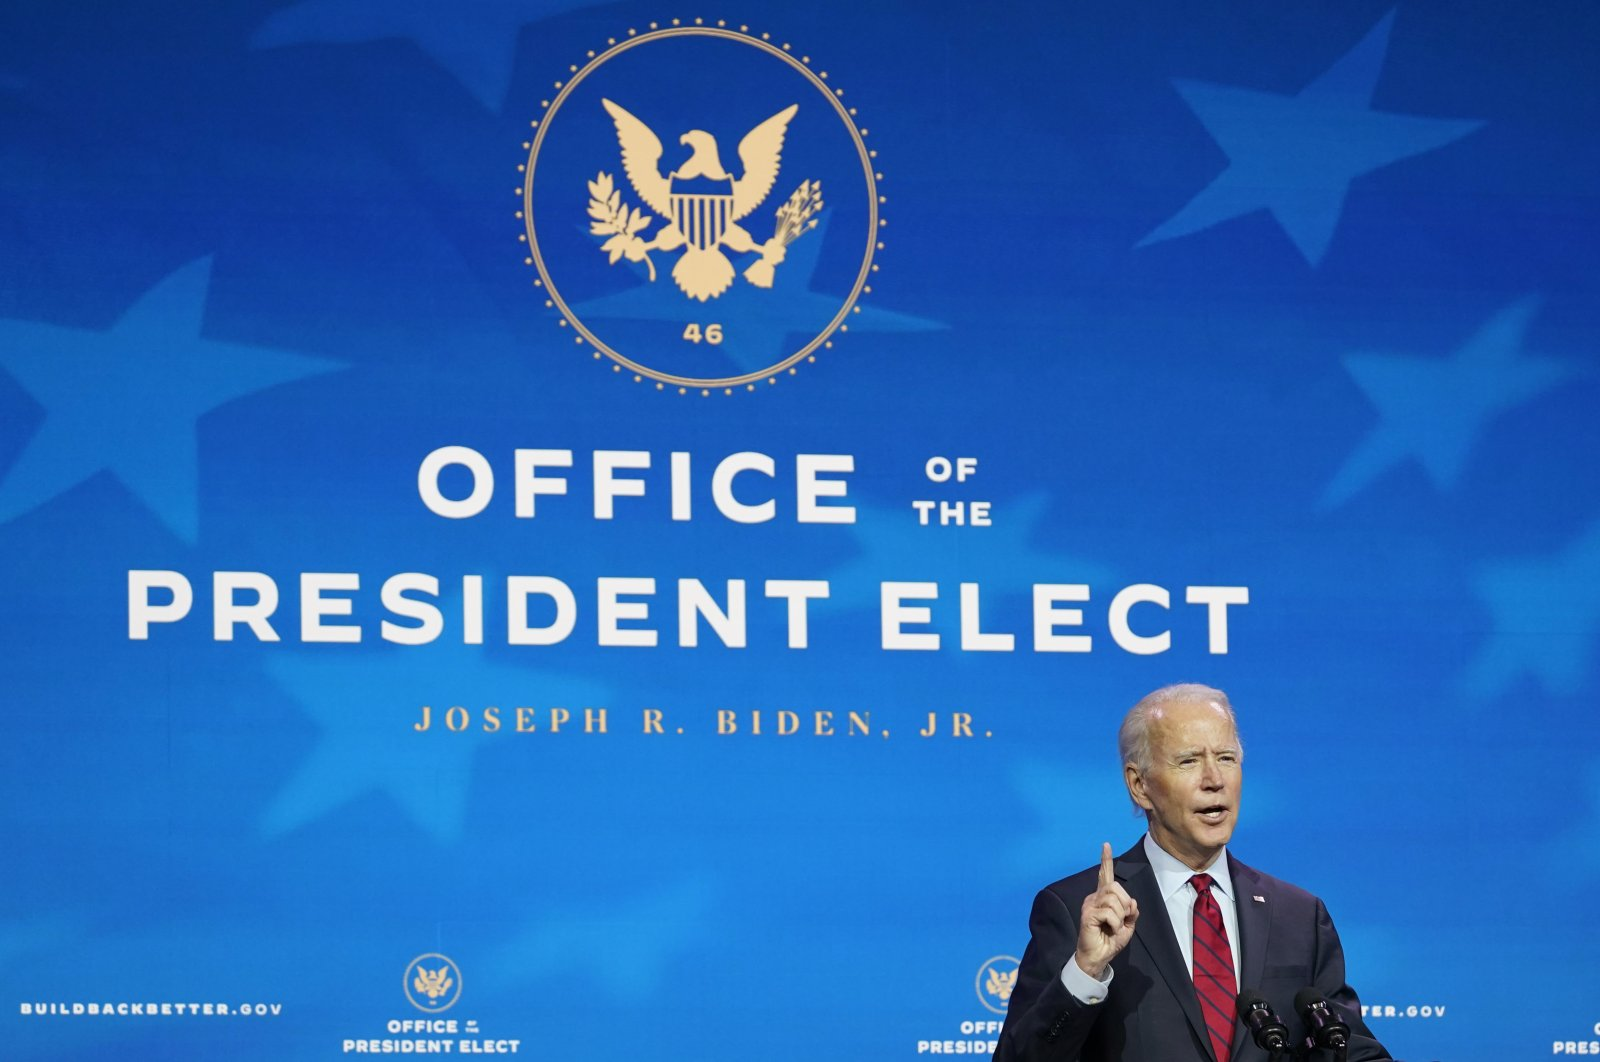 President-elect Joe Biden speaks during an event at The Queen theater in Wilmington, Delaware, U.S., Dec. 8, 2020. (AP Photo)